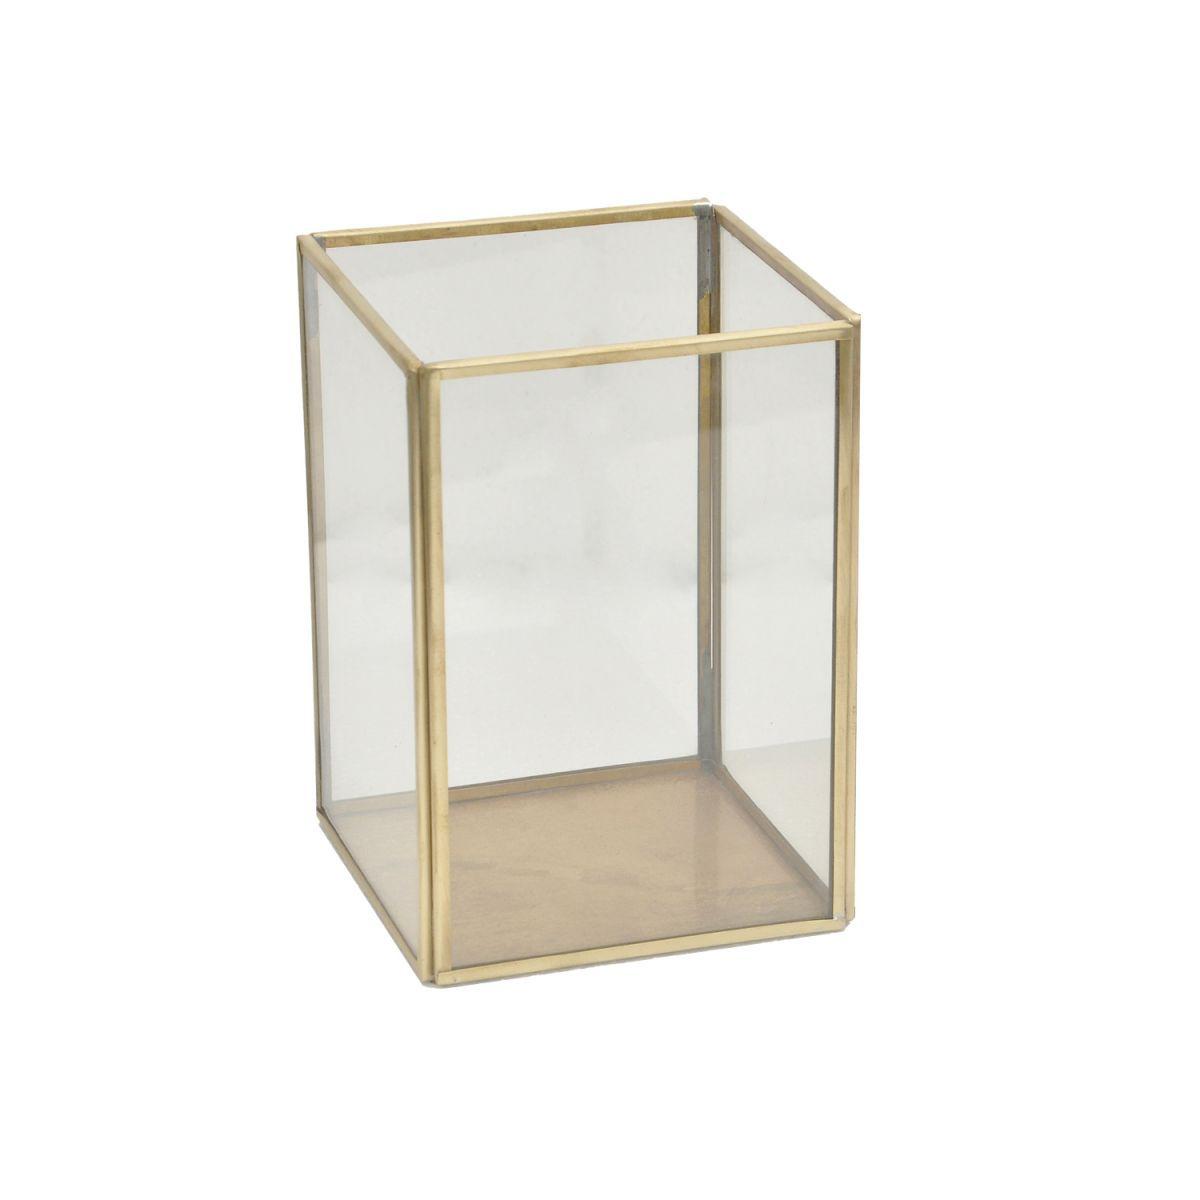 lantern glass brass finish 11x11 hg 155 cm